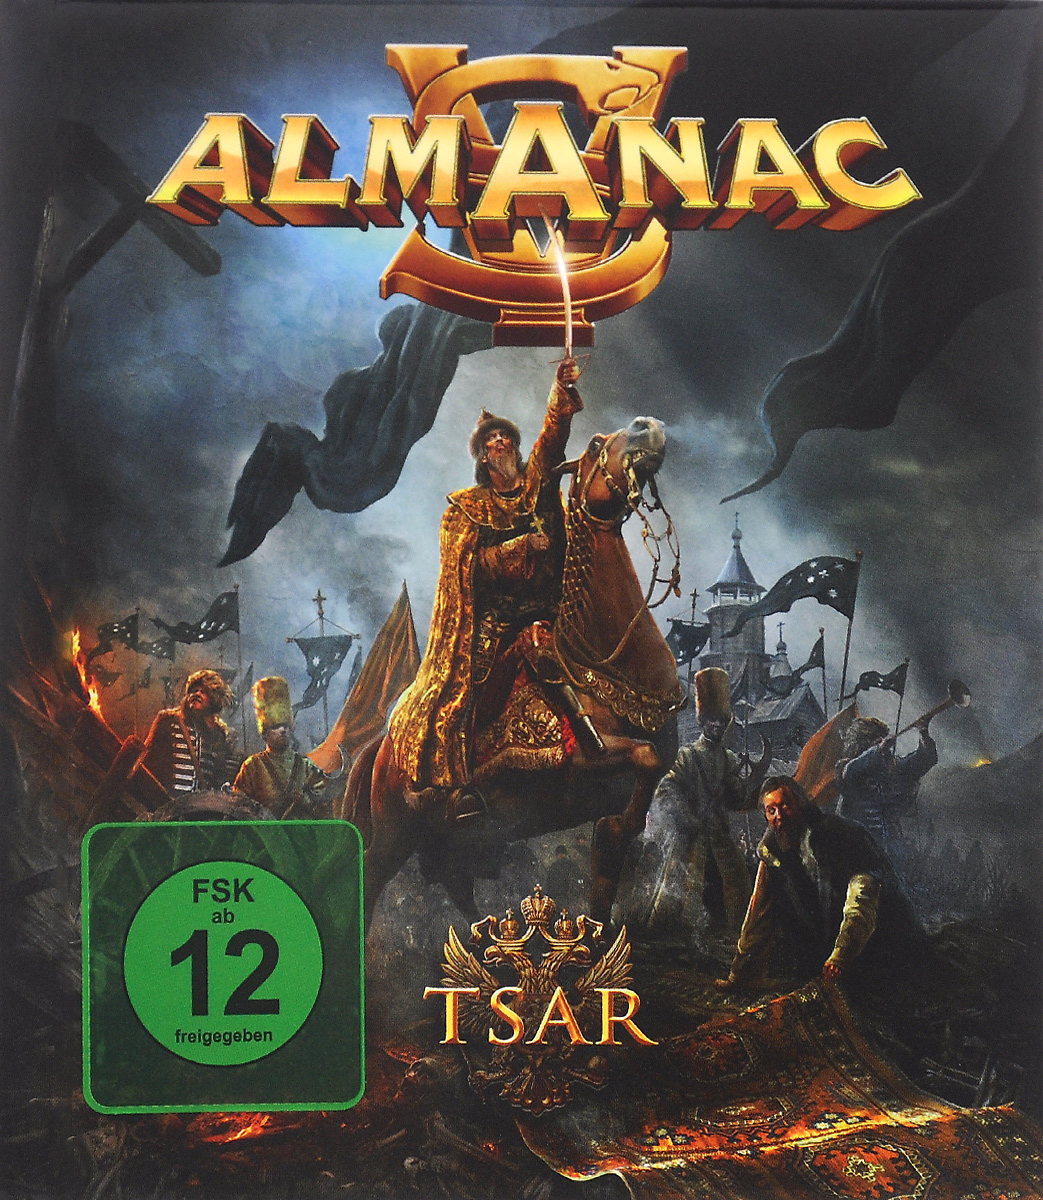 Almanac Almanac. Tsar (CD + DVD) музыка cd dvd audio